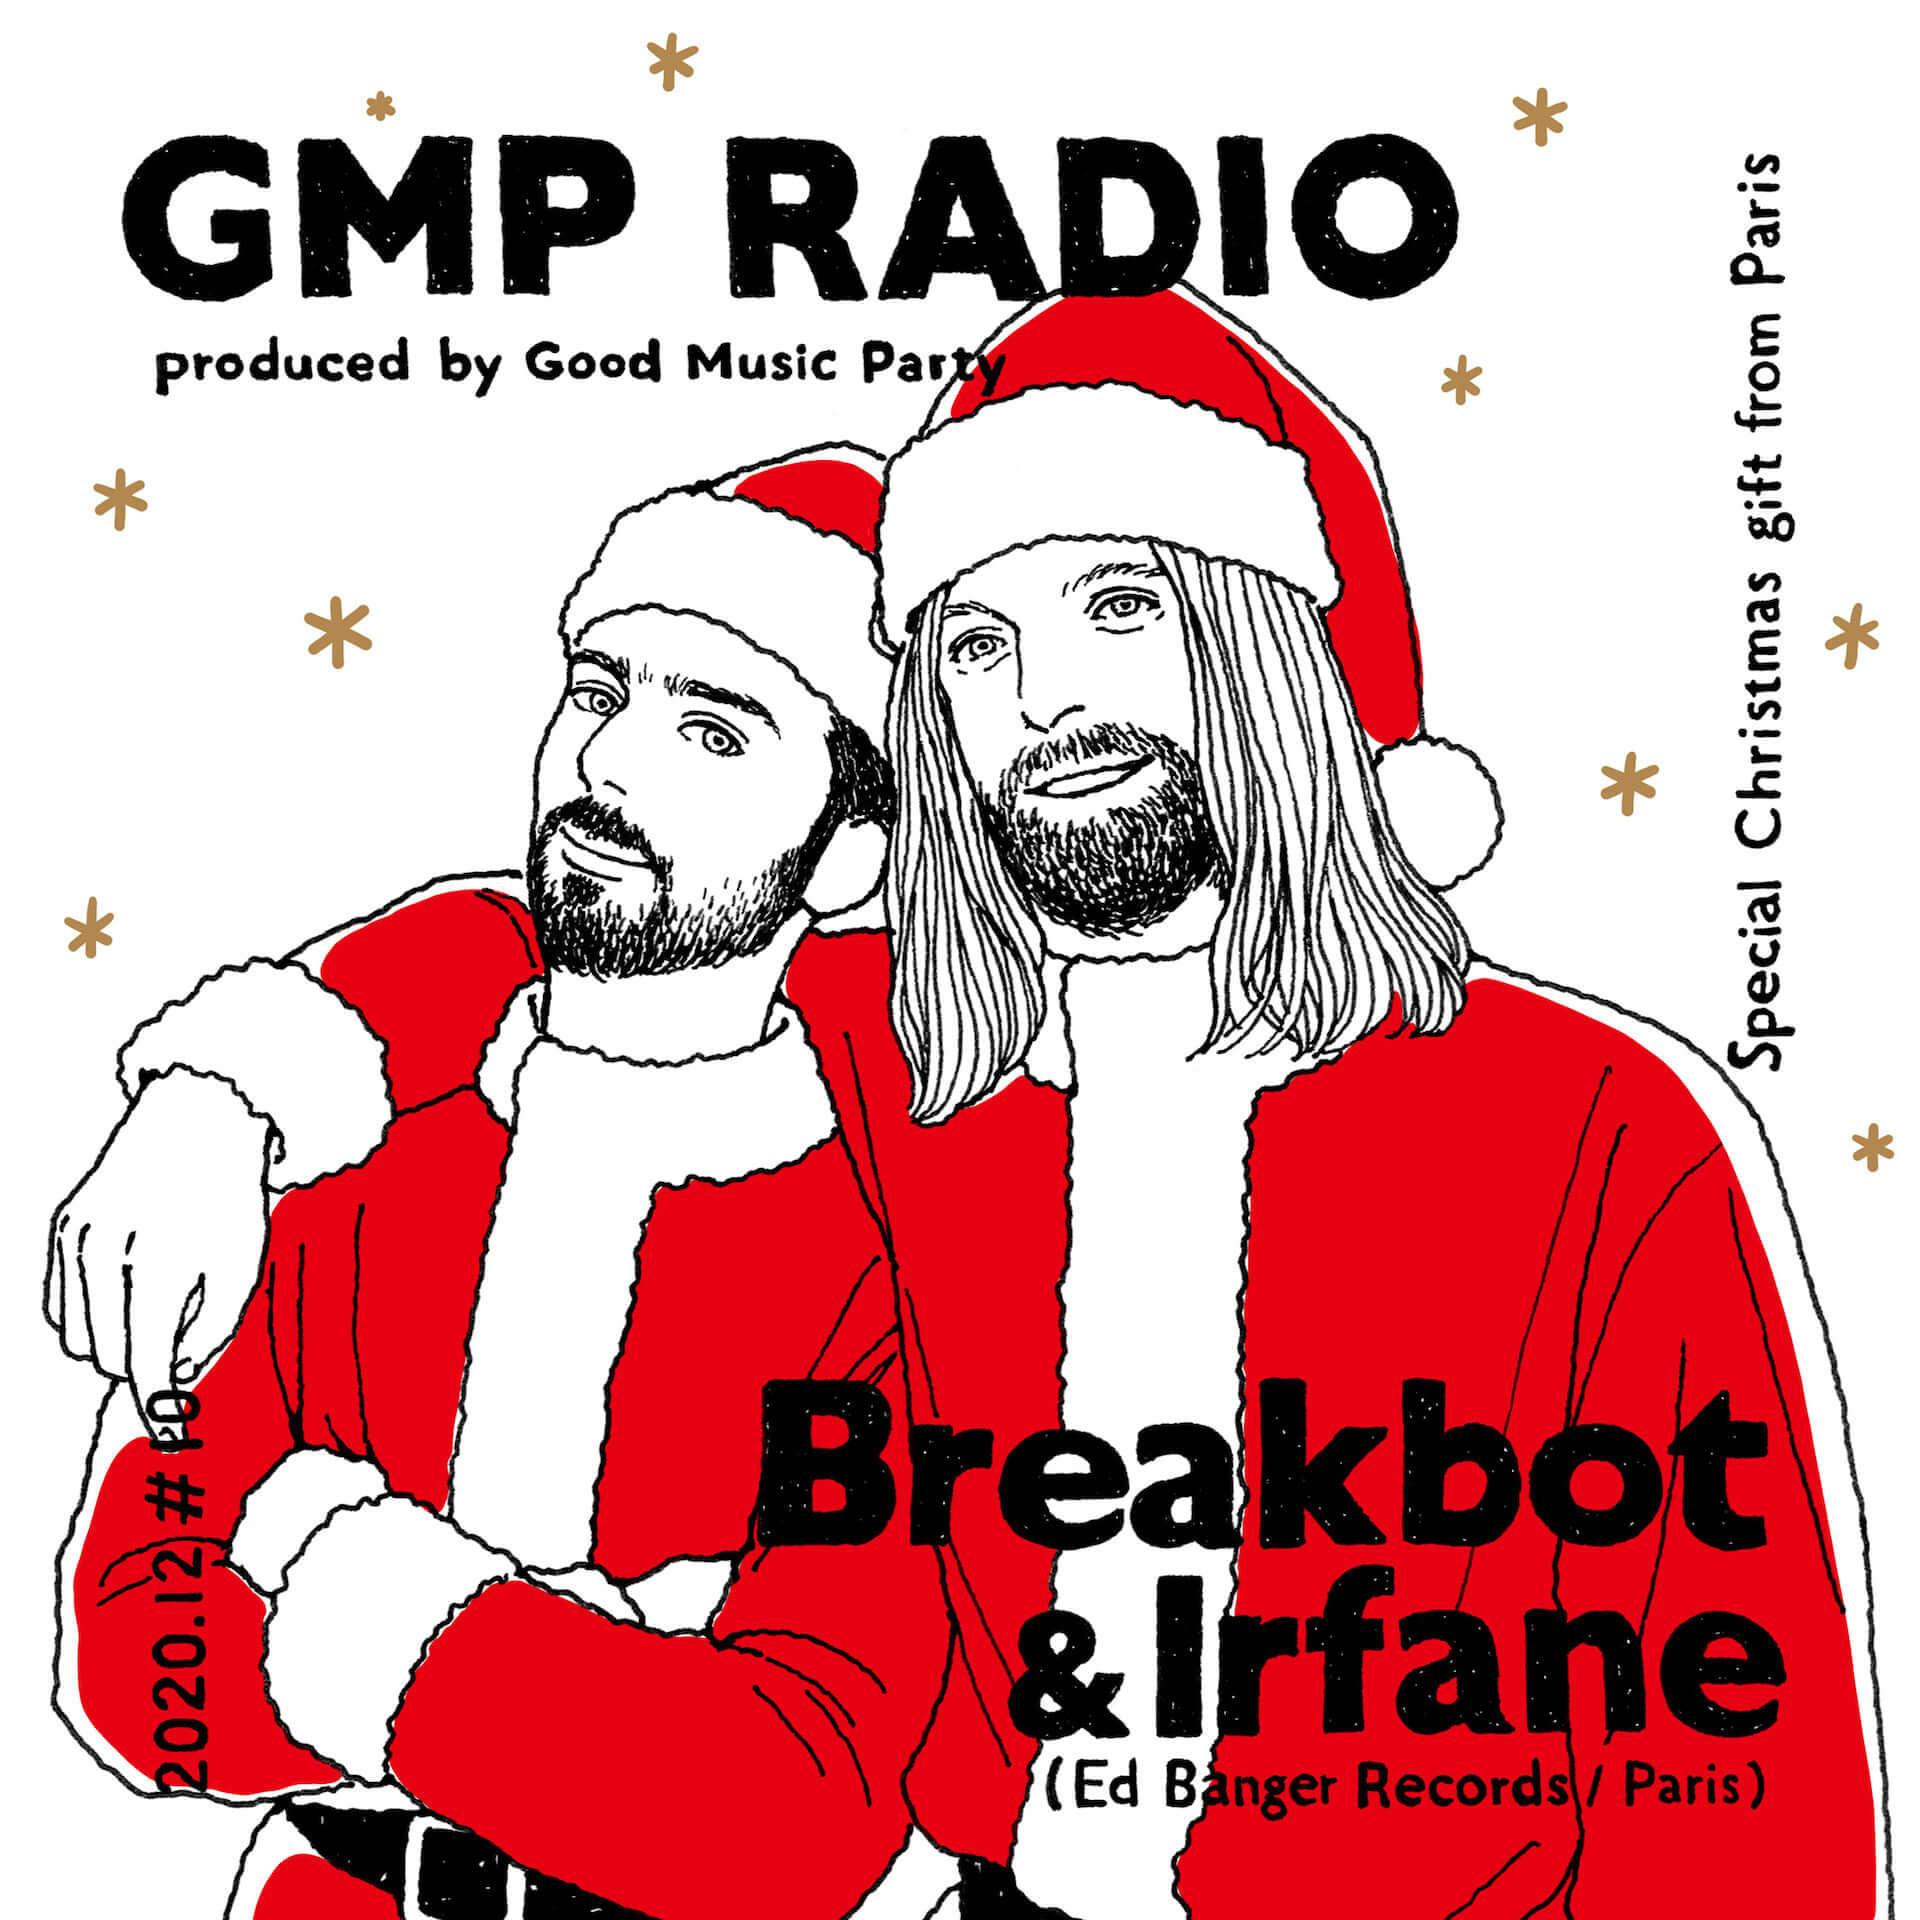 Breakbot & IrfaneのスペシャルDJミックスが「GMP Radio」にて公開!Run-DMC、Otis Reddingらのクリスマスソングなどセレクト music201211_breakbot-irfane_2-1920x1920